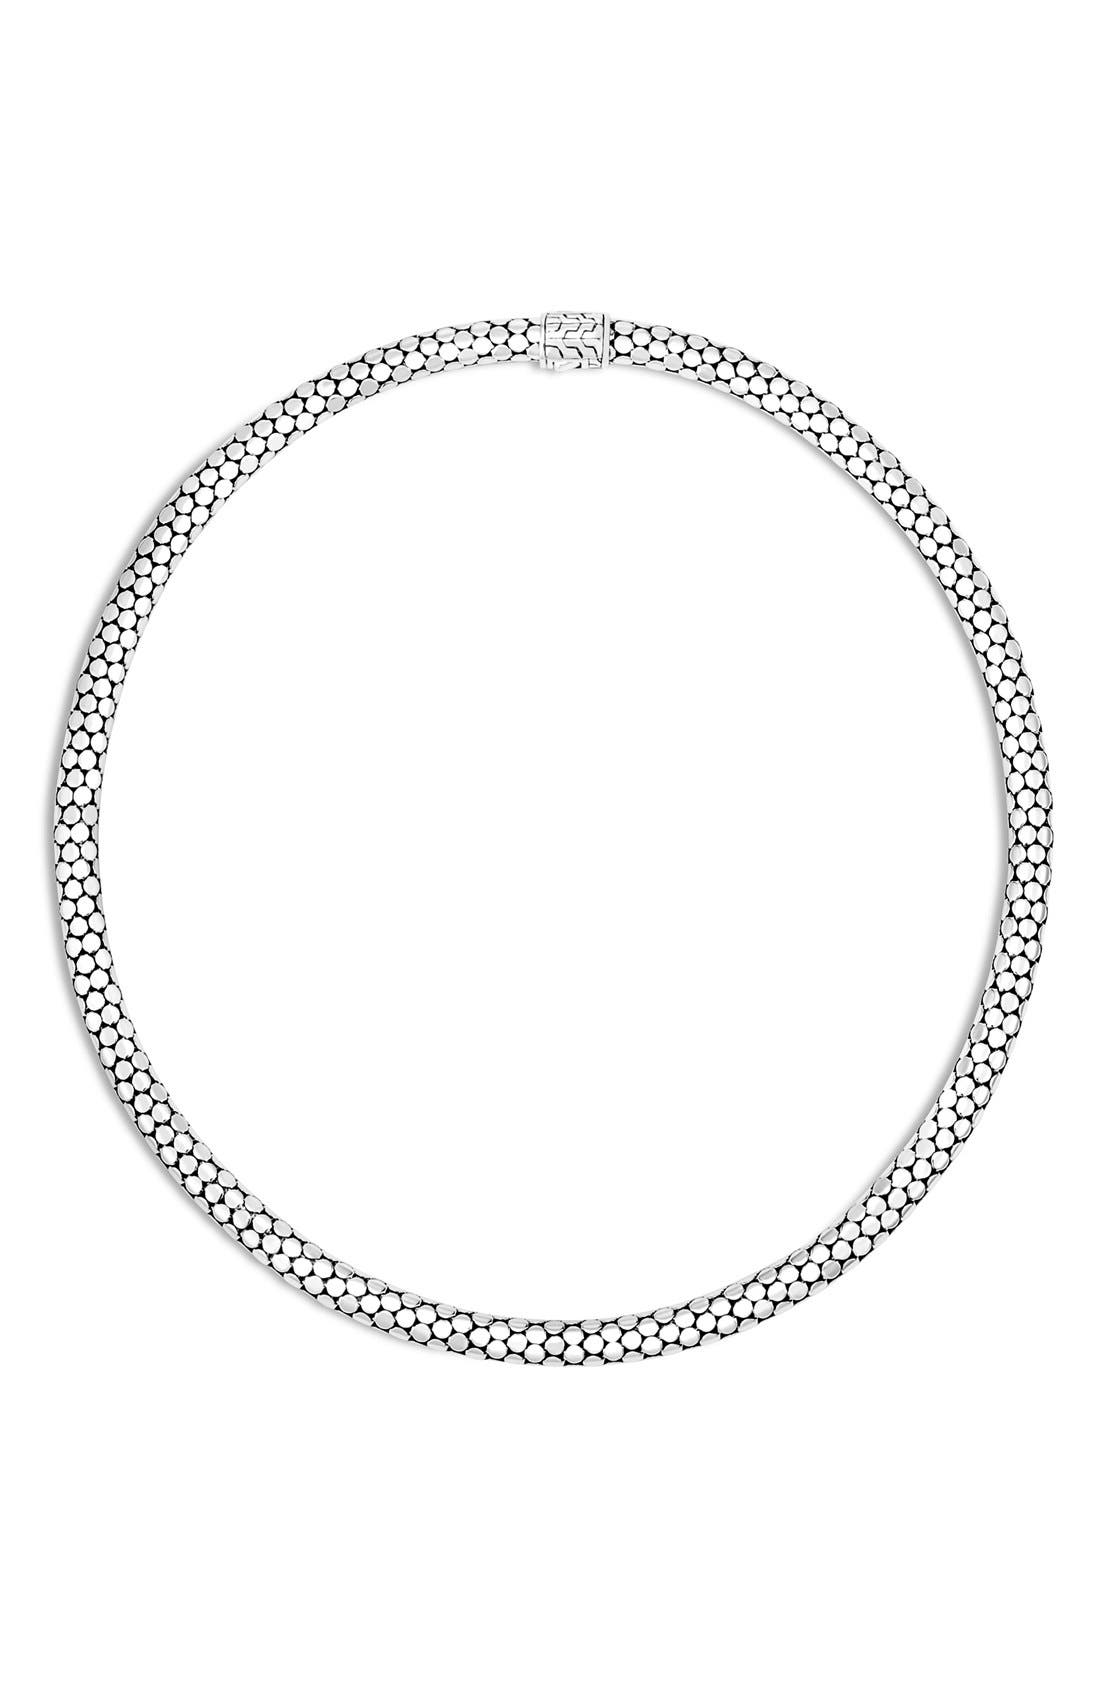 John Hardy 'Dot' Chain Necklace